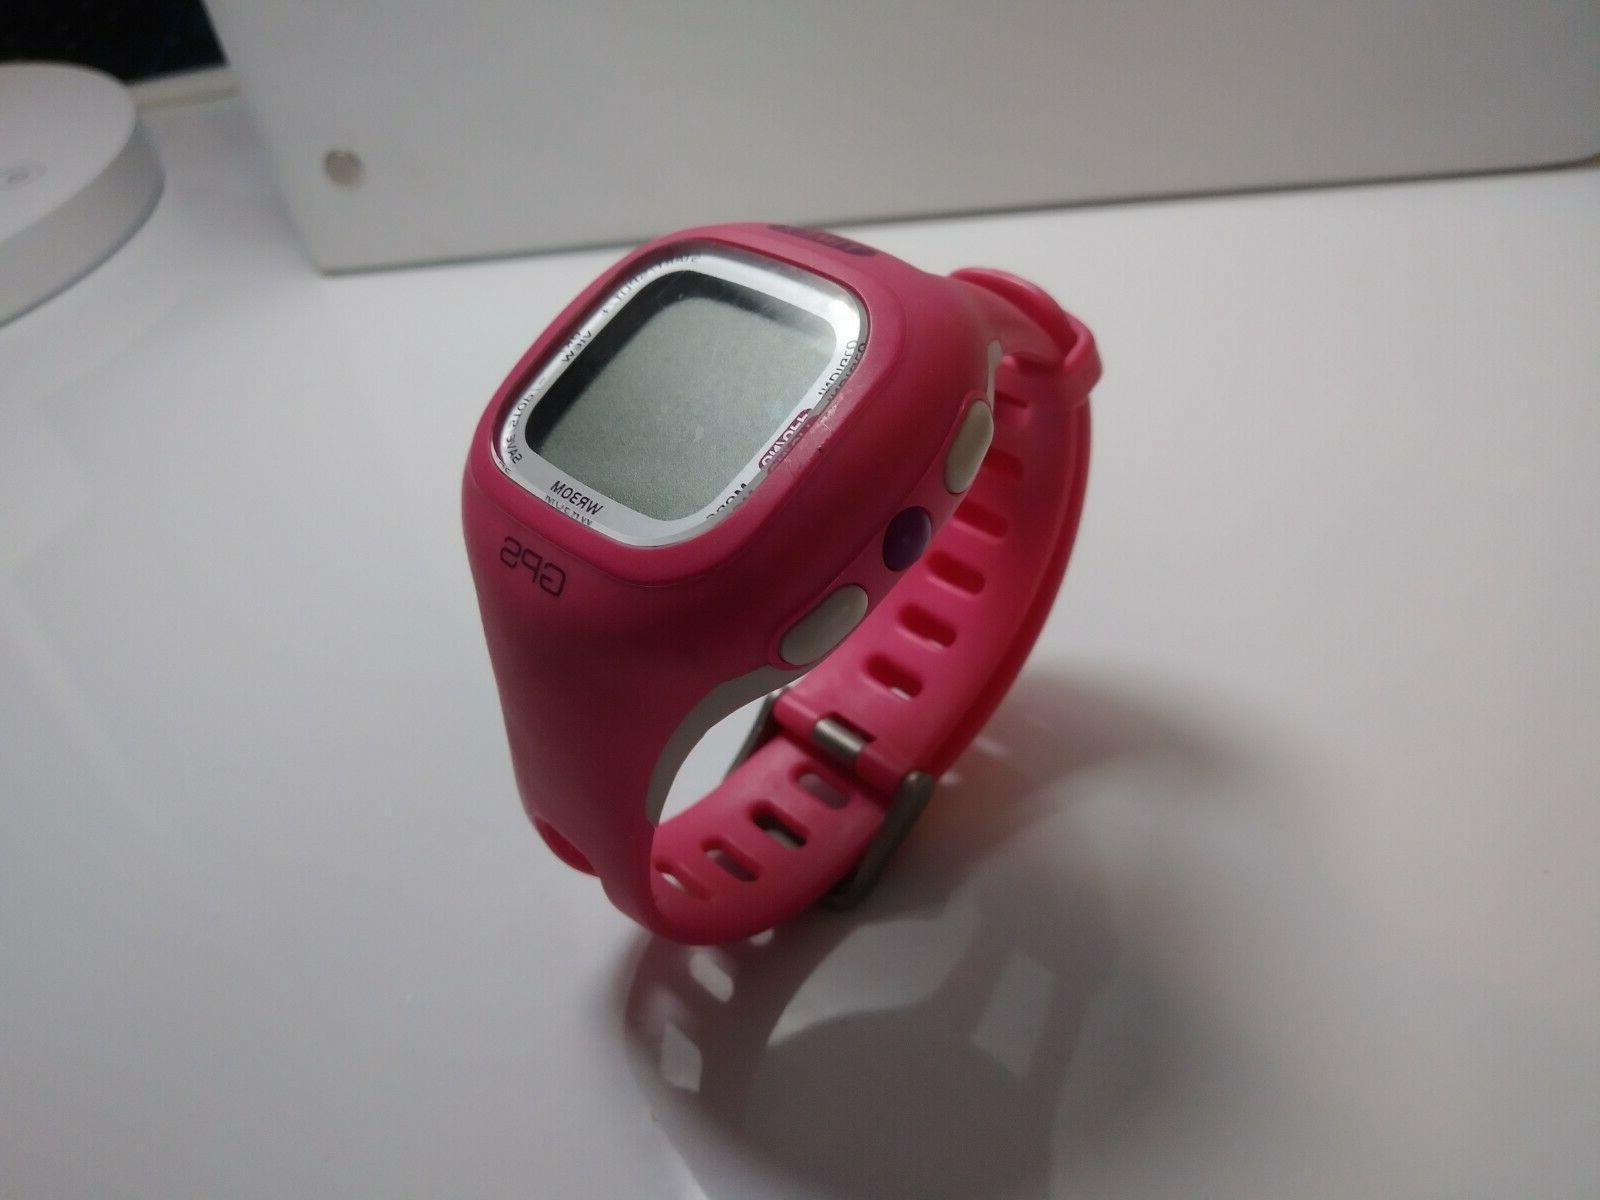 m434 marathon gps fitness watch pink indiglo